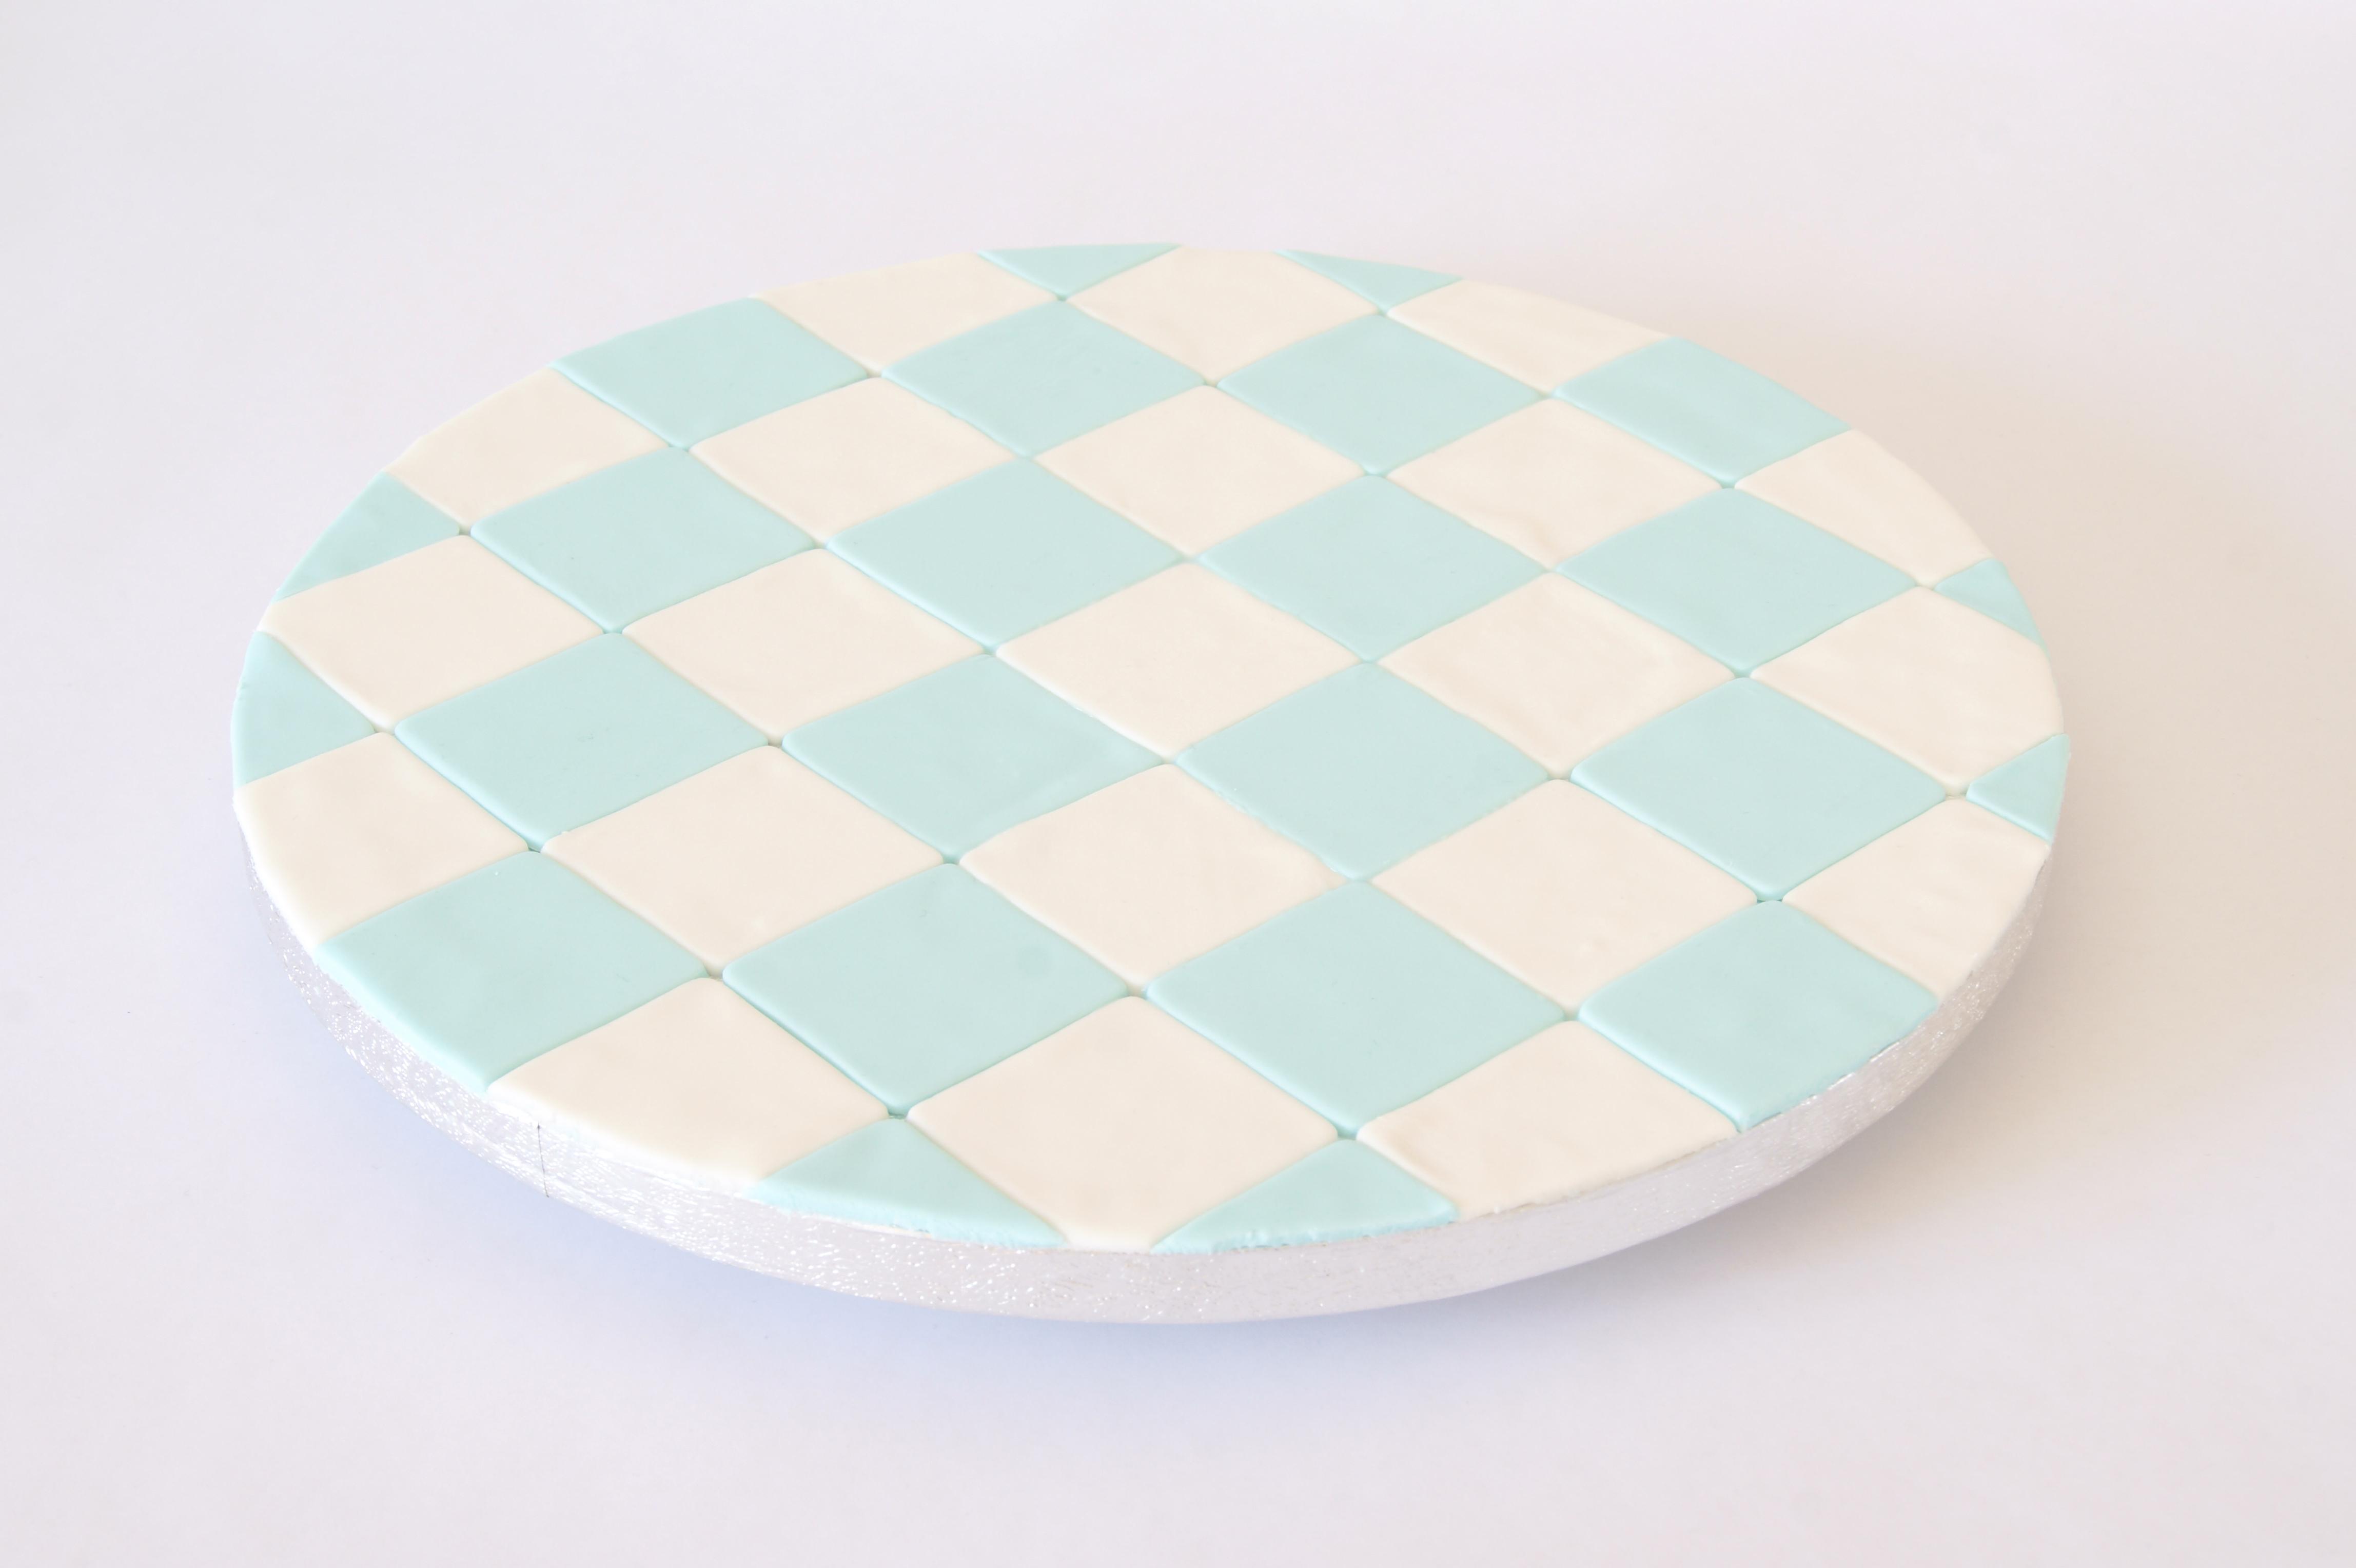 Ice-Cream-Board-1.jpg#asset:19061